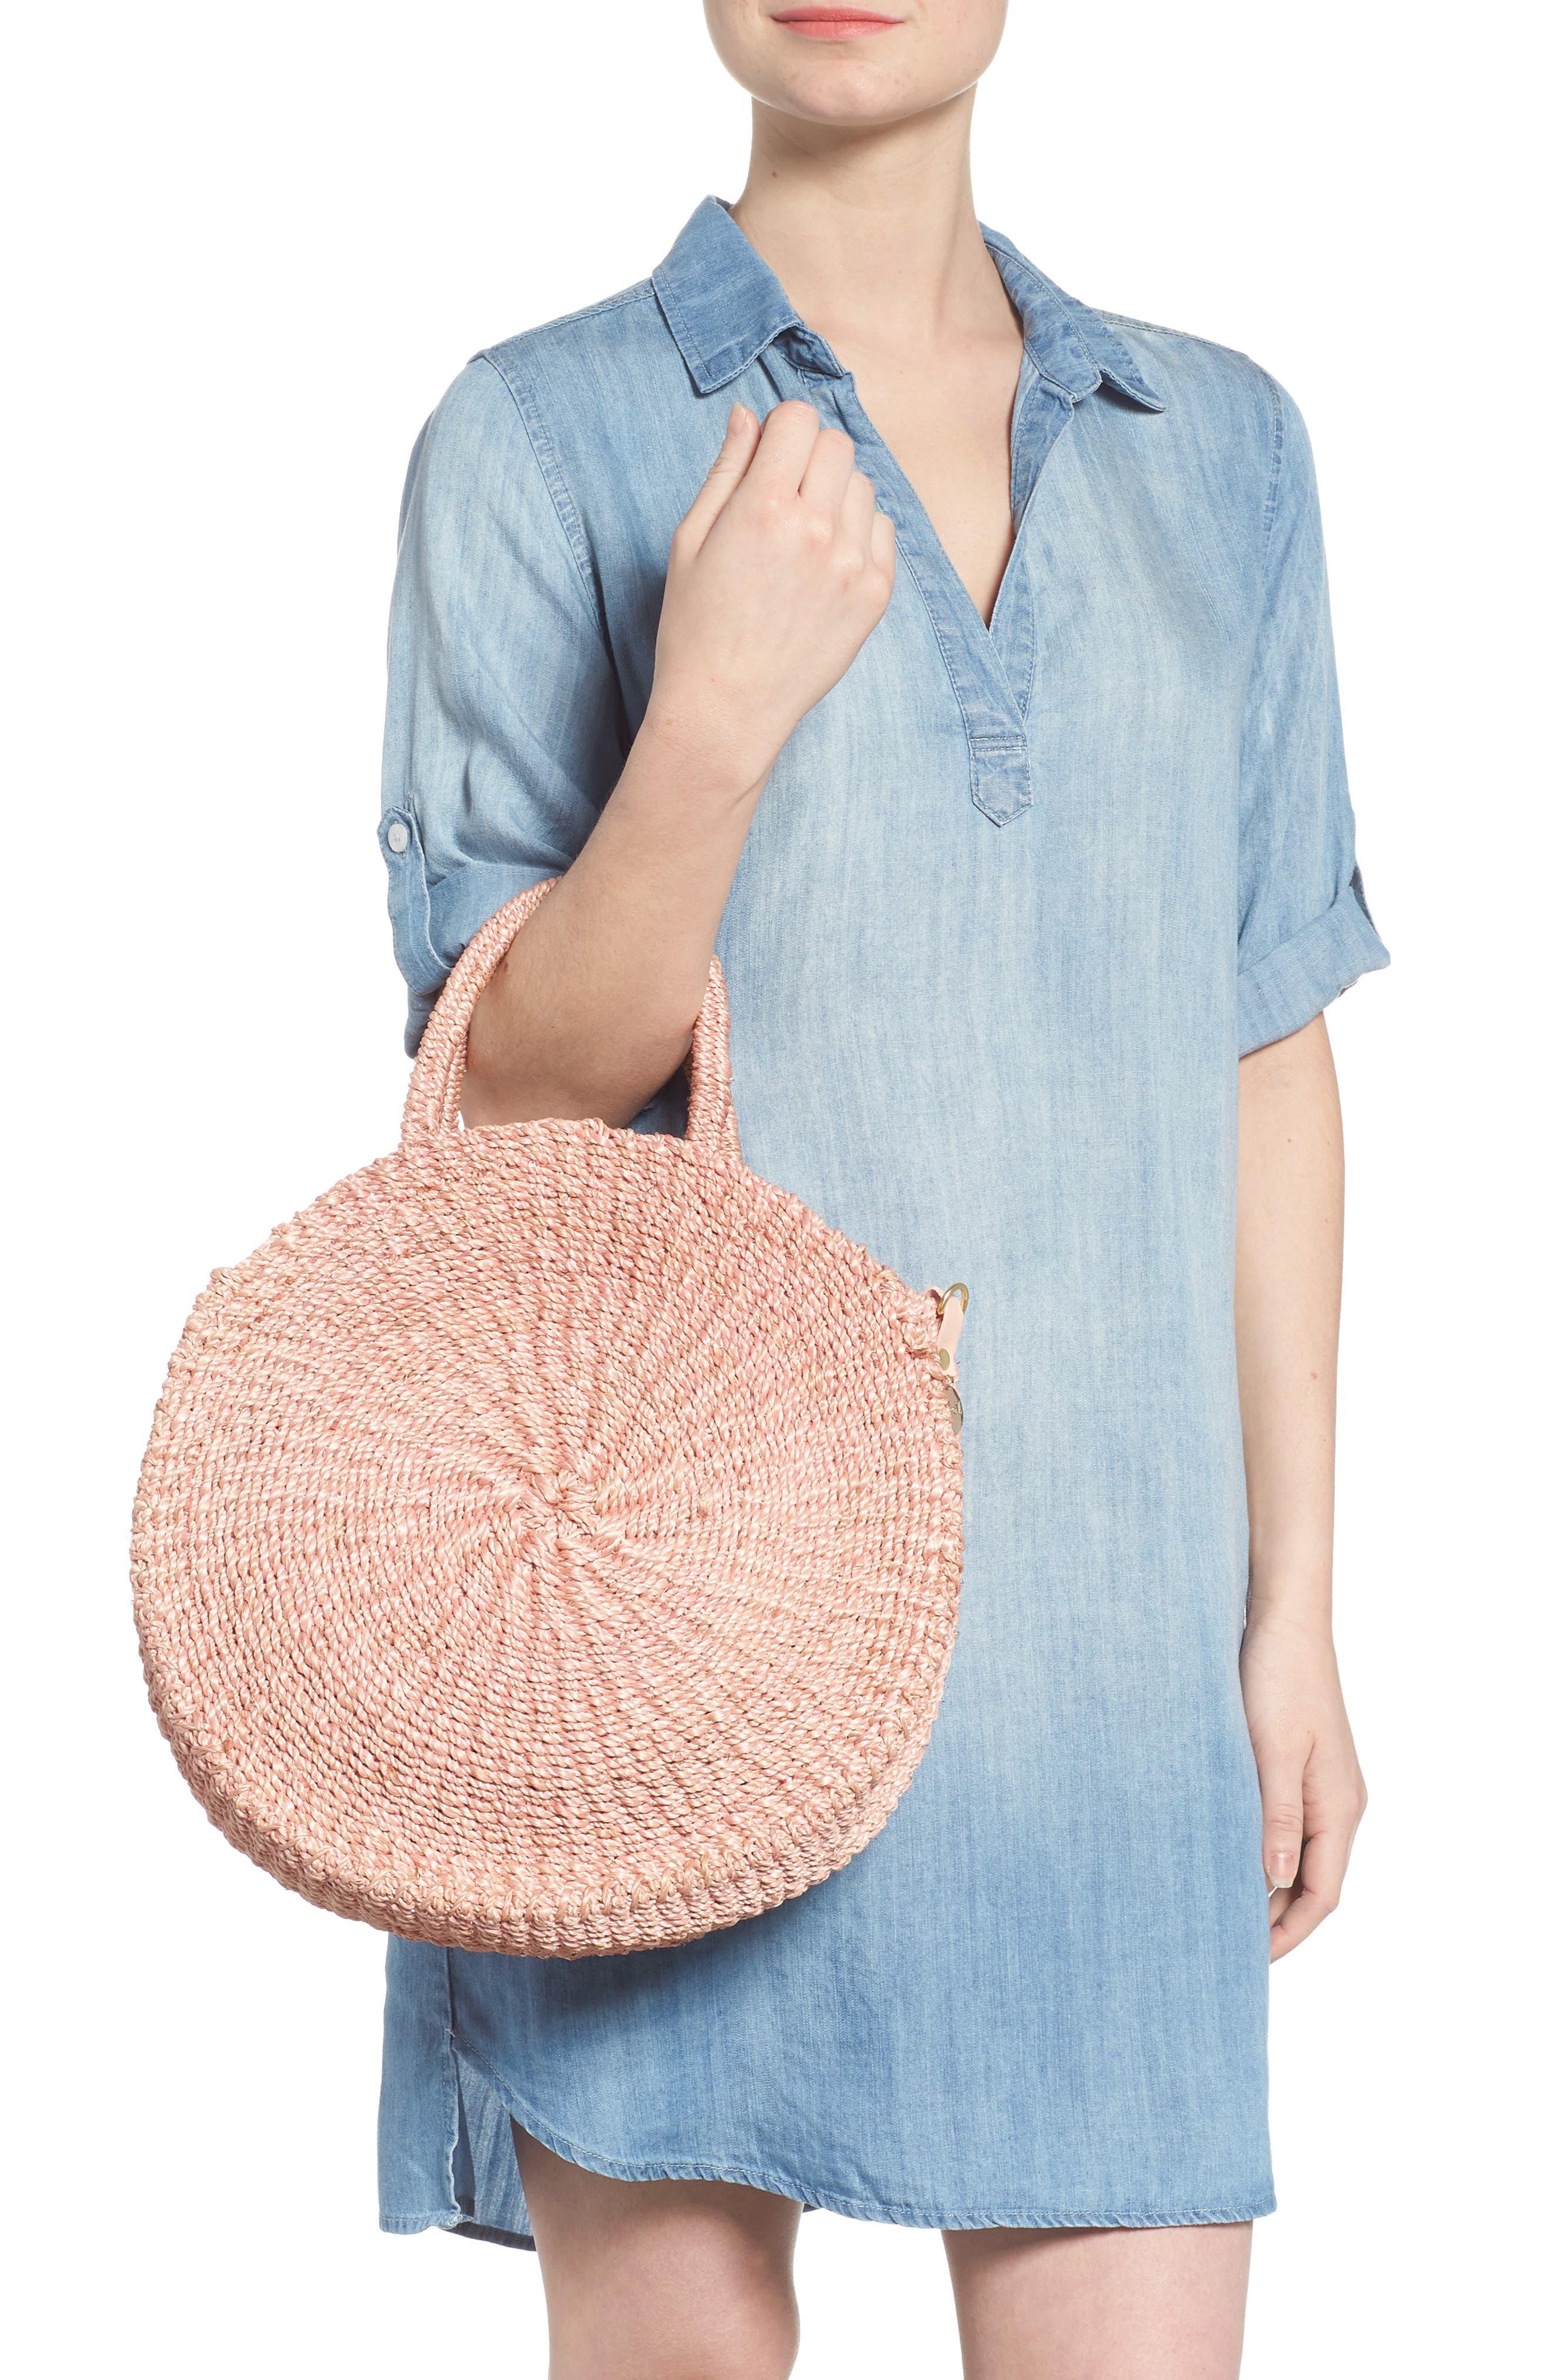 Alice Woven Sisal Straw Bag,                             Alternate thumbnail 2, color,                             Blush Woven